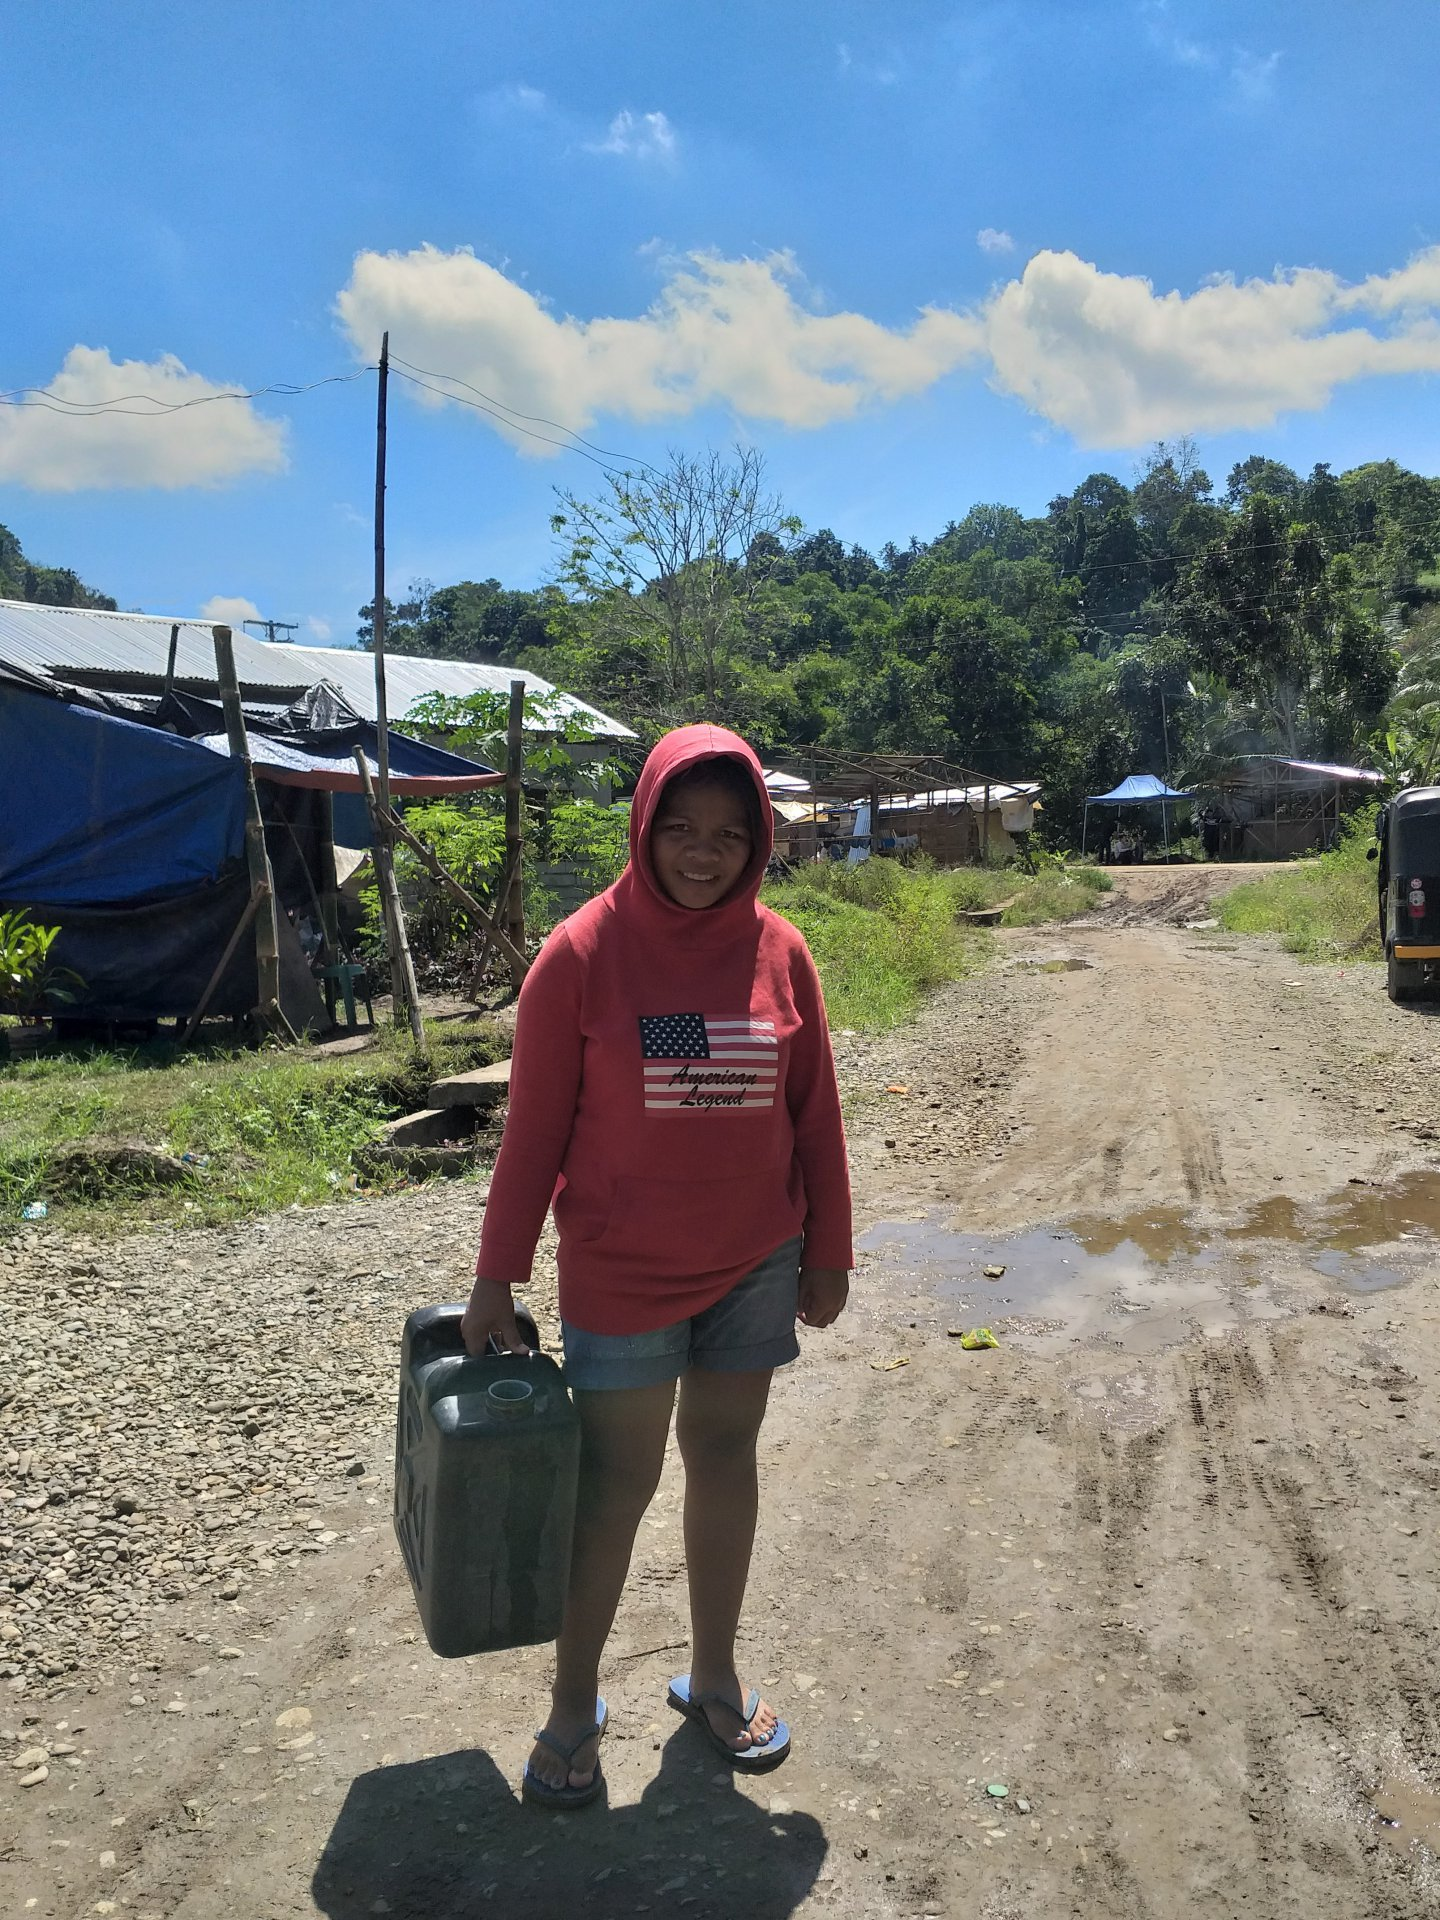 https://www.waterforlife.nl/files/visuals/_1920x1920_fit_center-center_85_none/Filipijnen_beneficiary-4-kopie.jpg